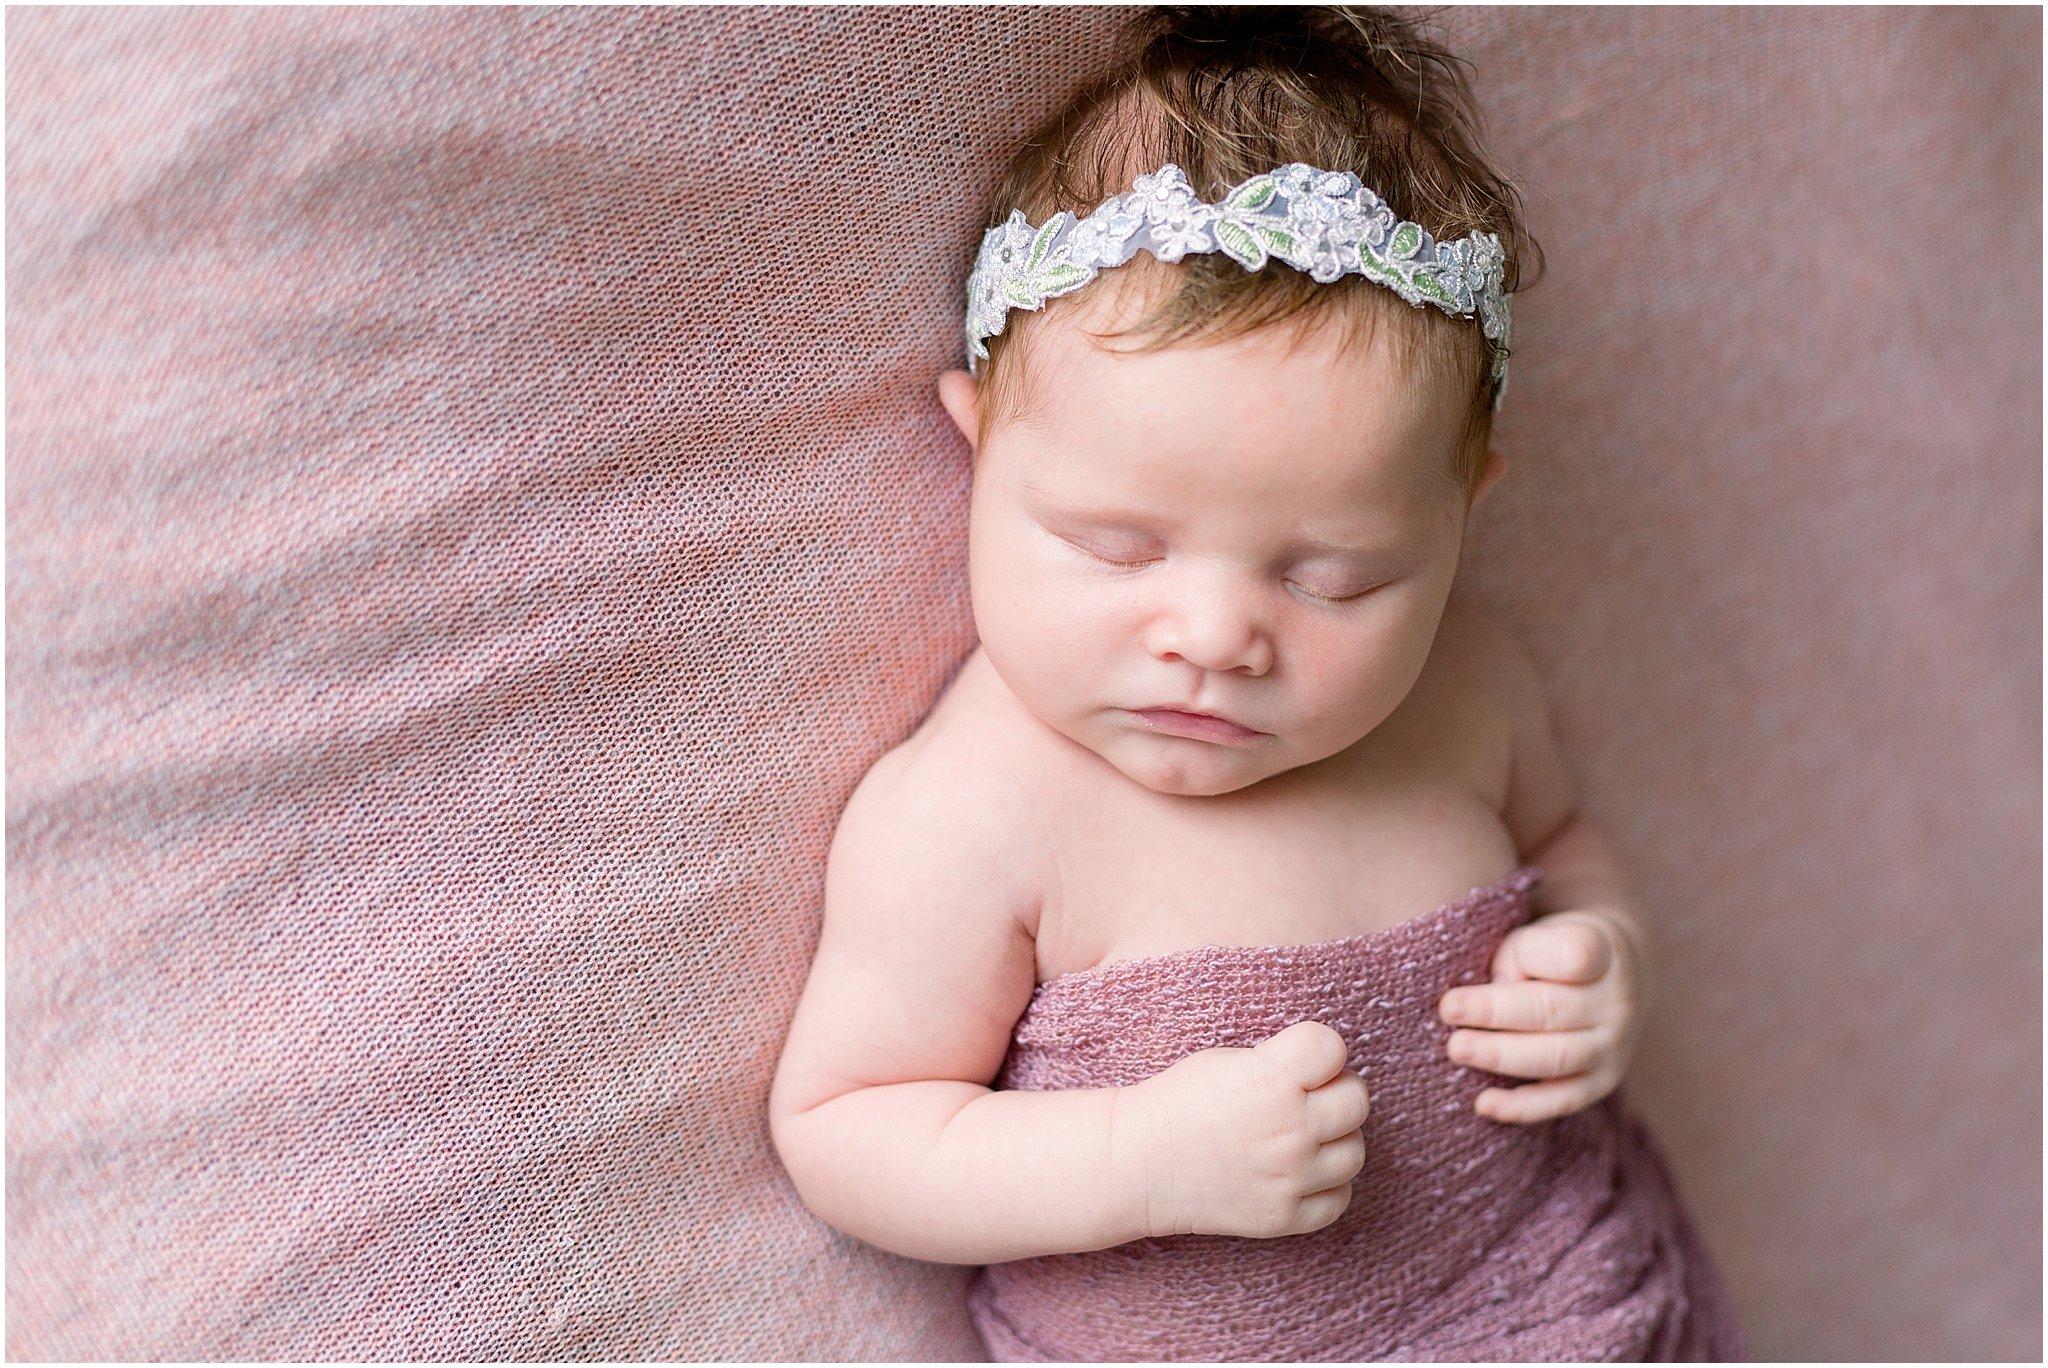 Winter-Garden-Maternity-Newborn-Photographer_0029.jpg